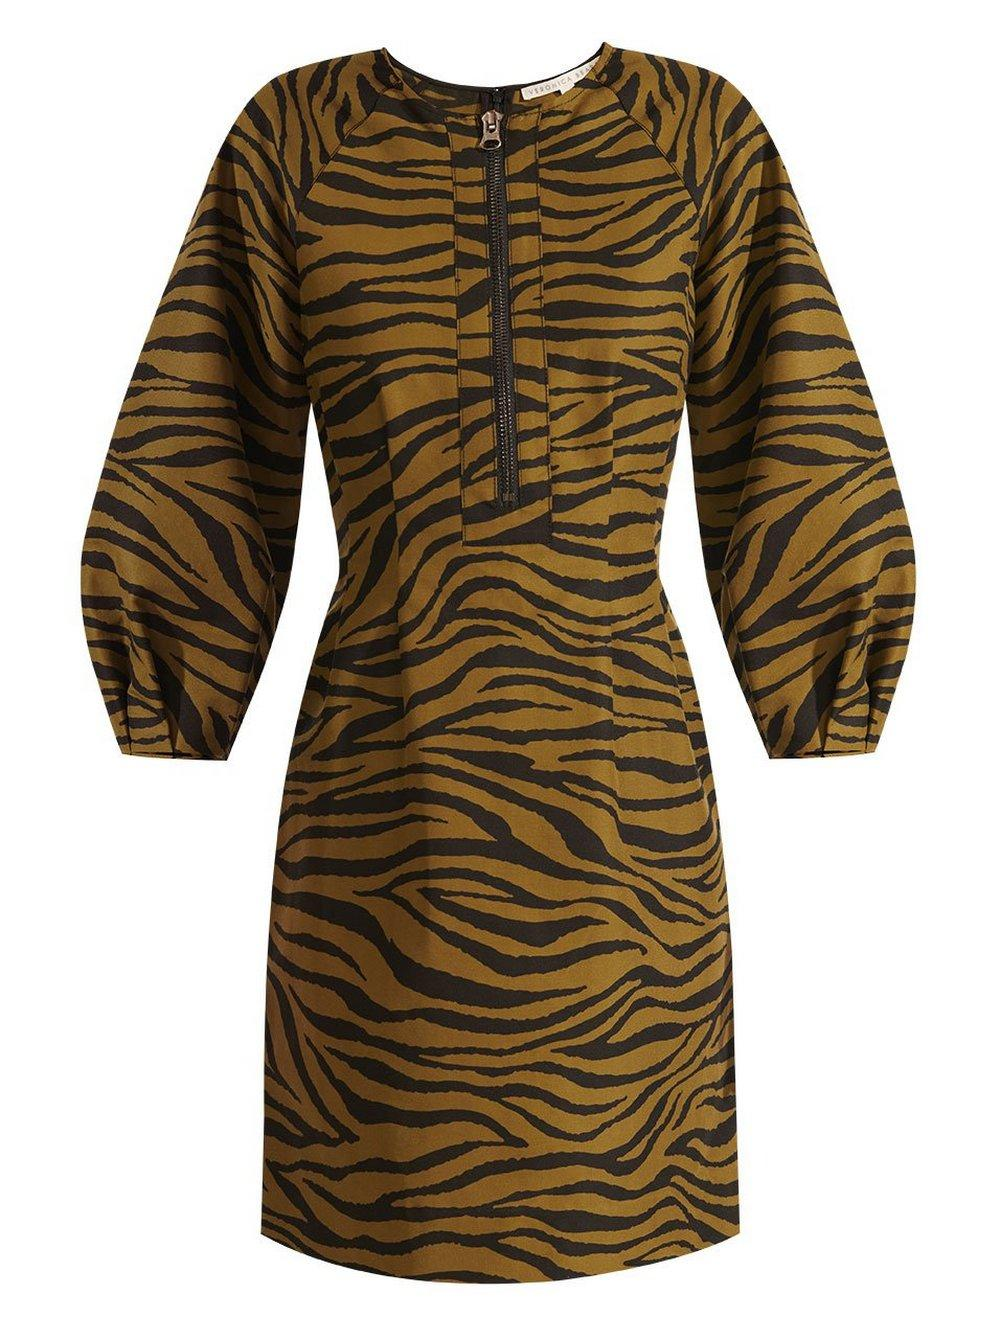 Navi Dress Item # 2006NP0152931